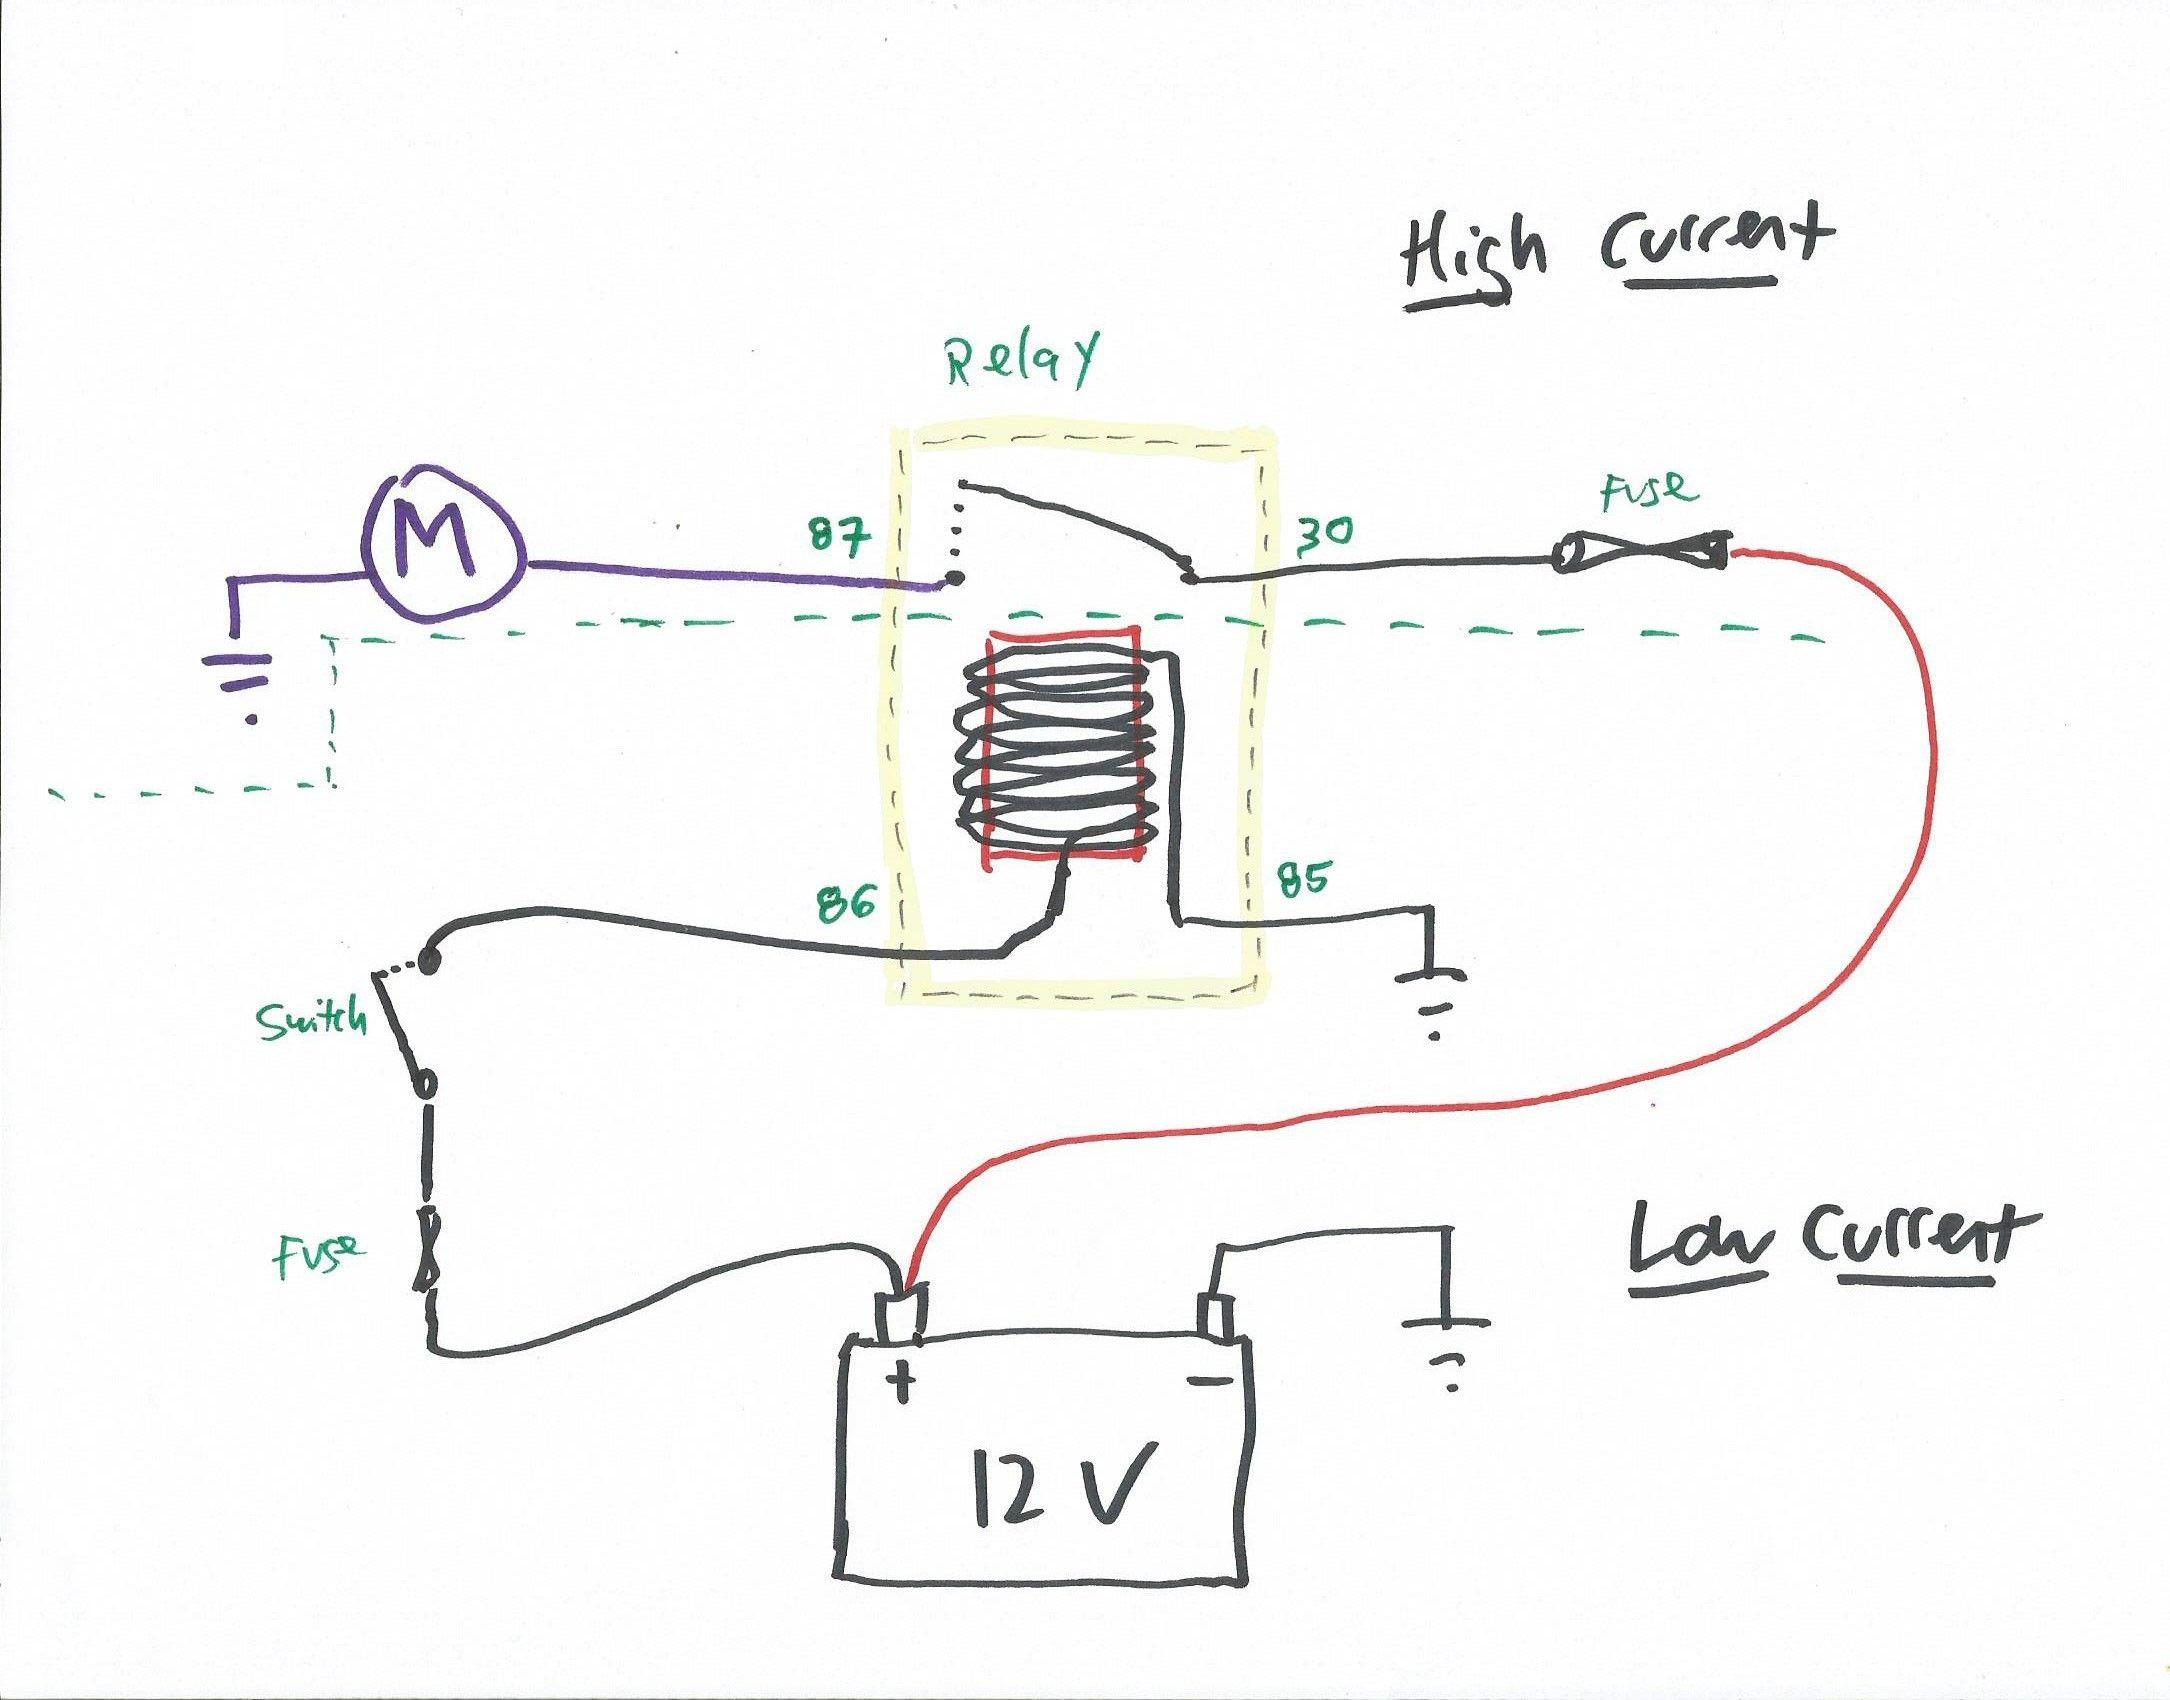 Lovely Wiring Diagram Ring Main sockets #diagrams #